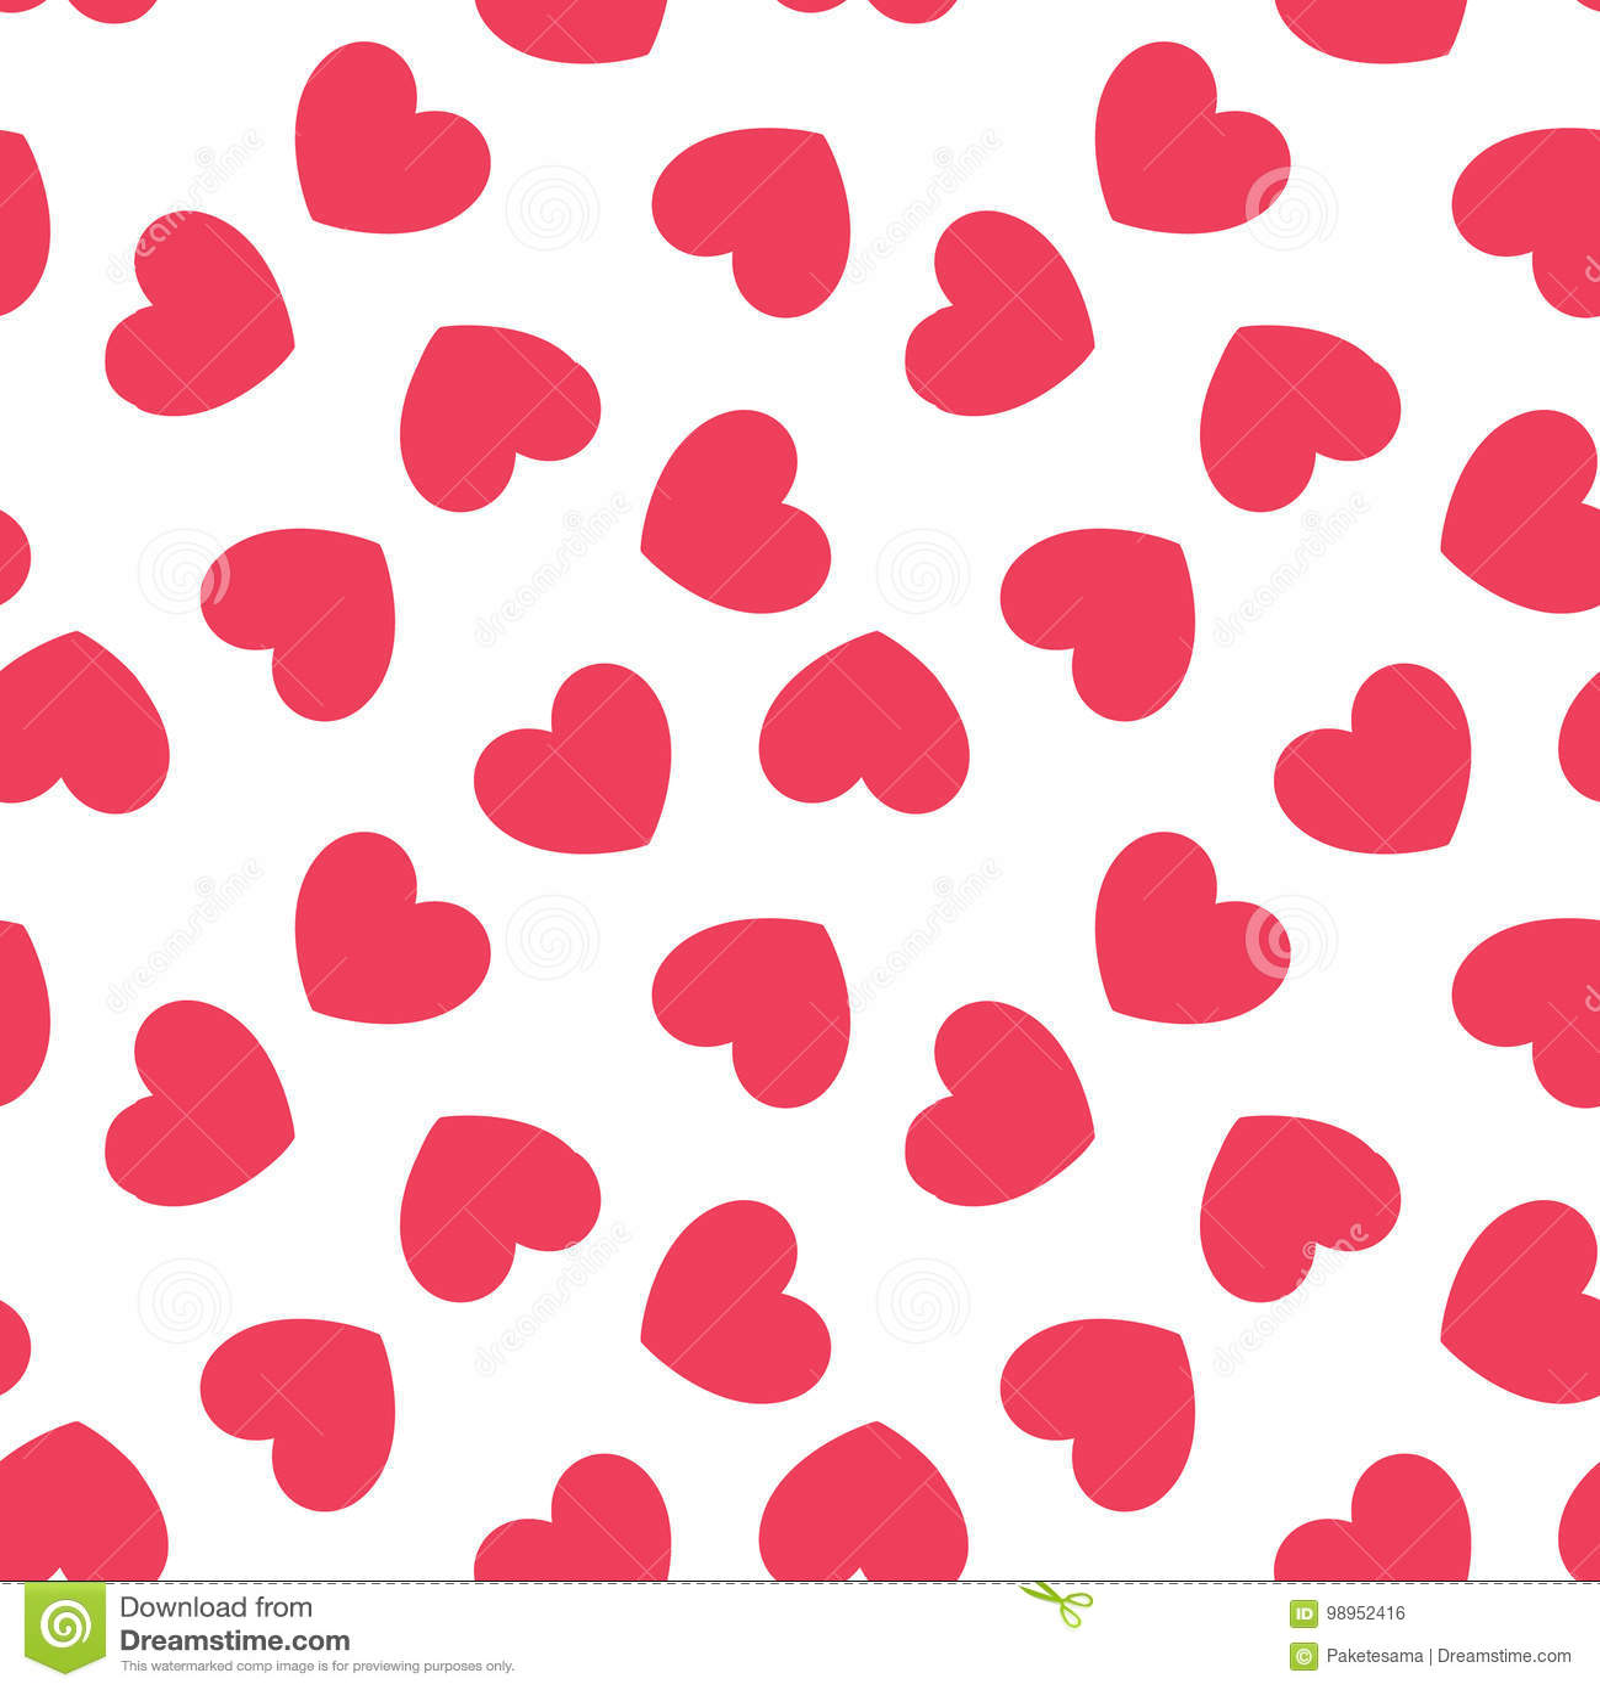 Seamless Hearts Pattern Stock Vector Illustration Of Card 98952416